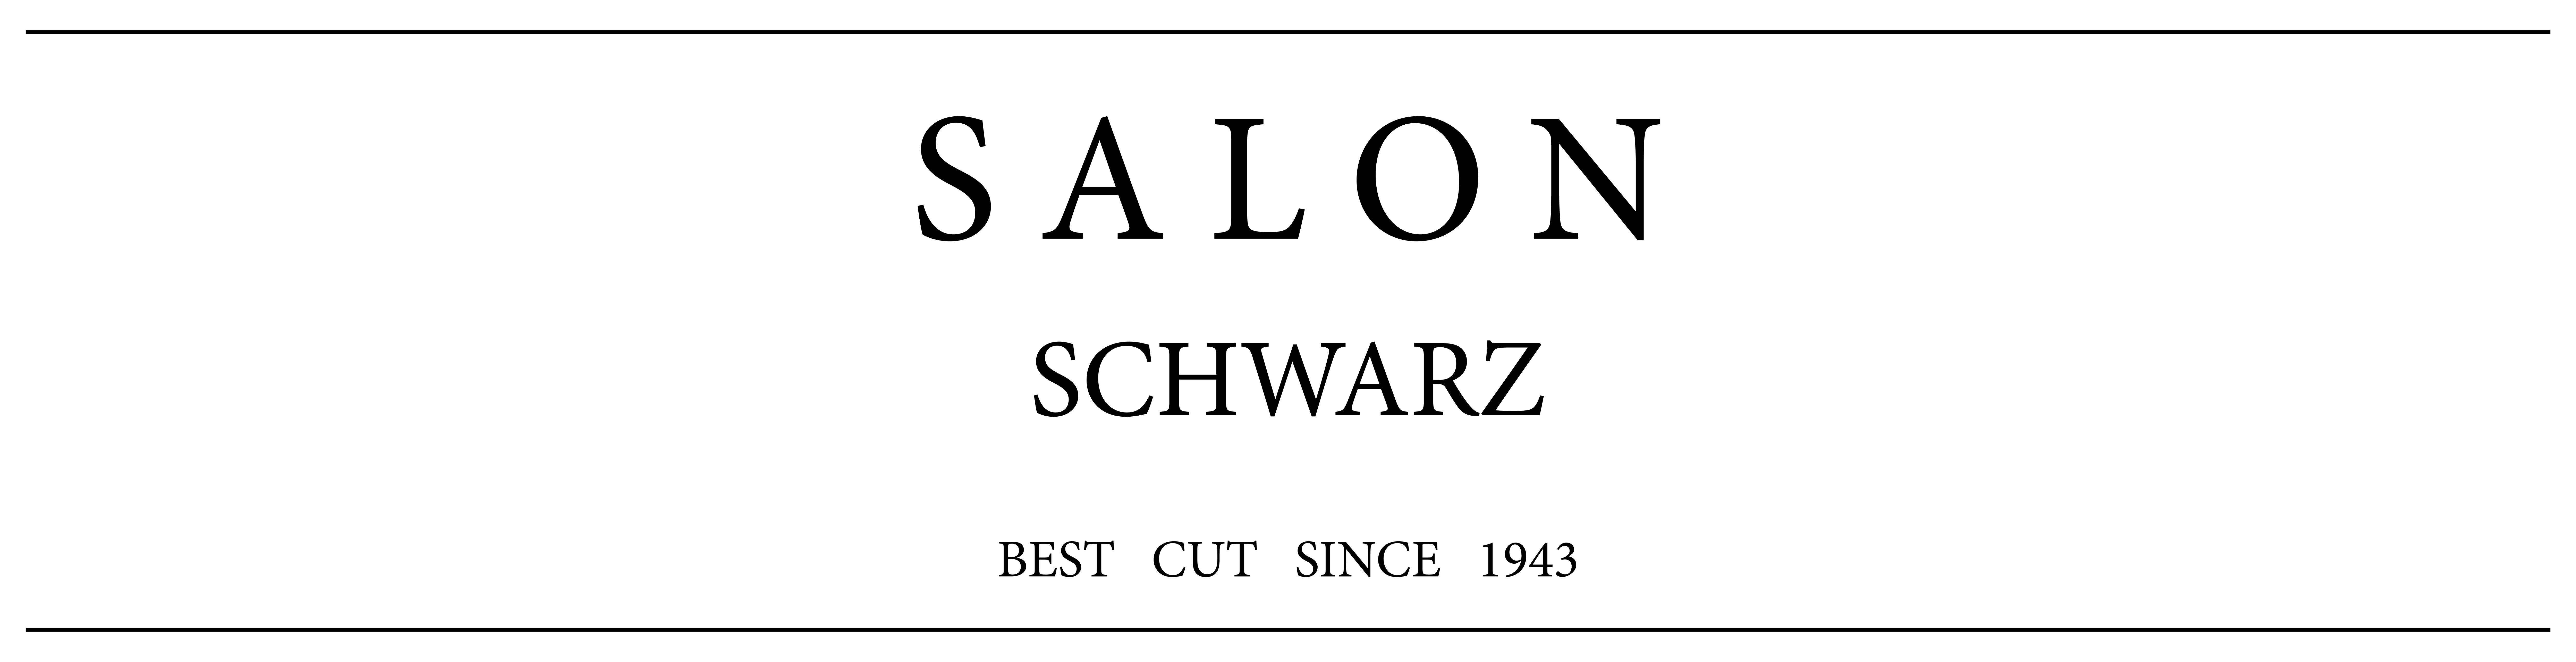 Salon Schwarz